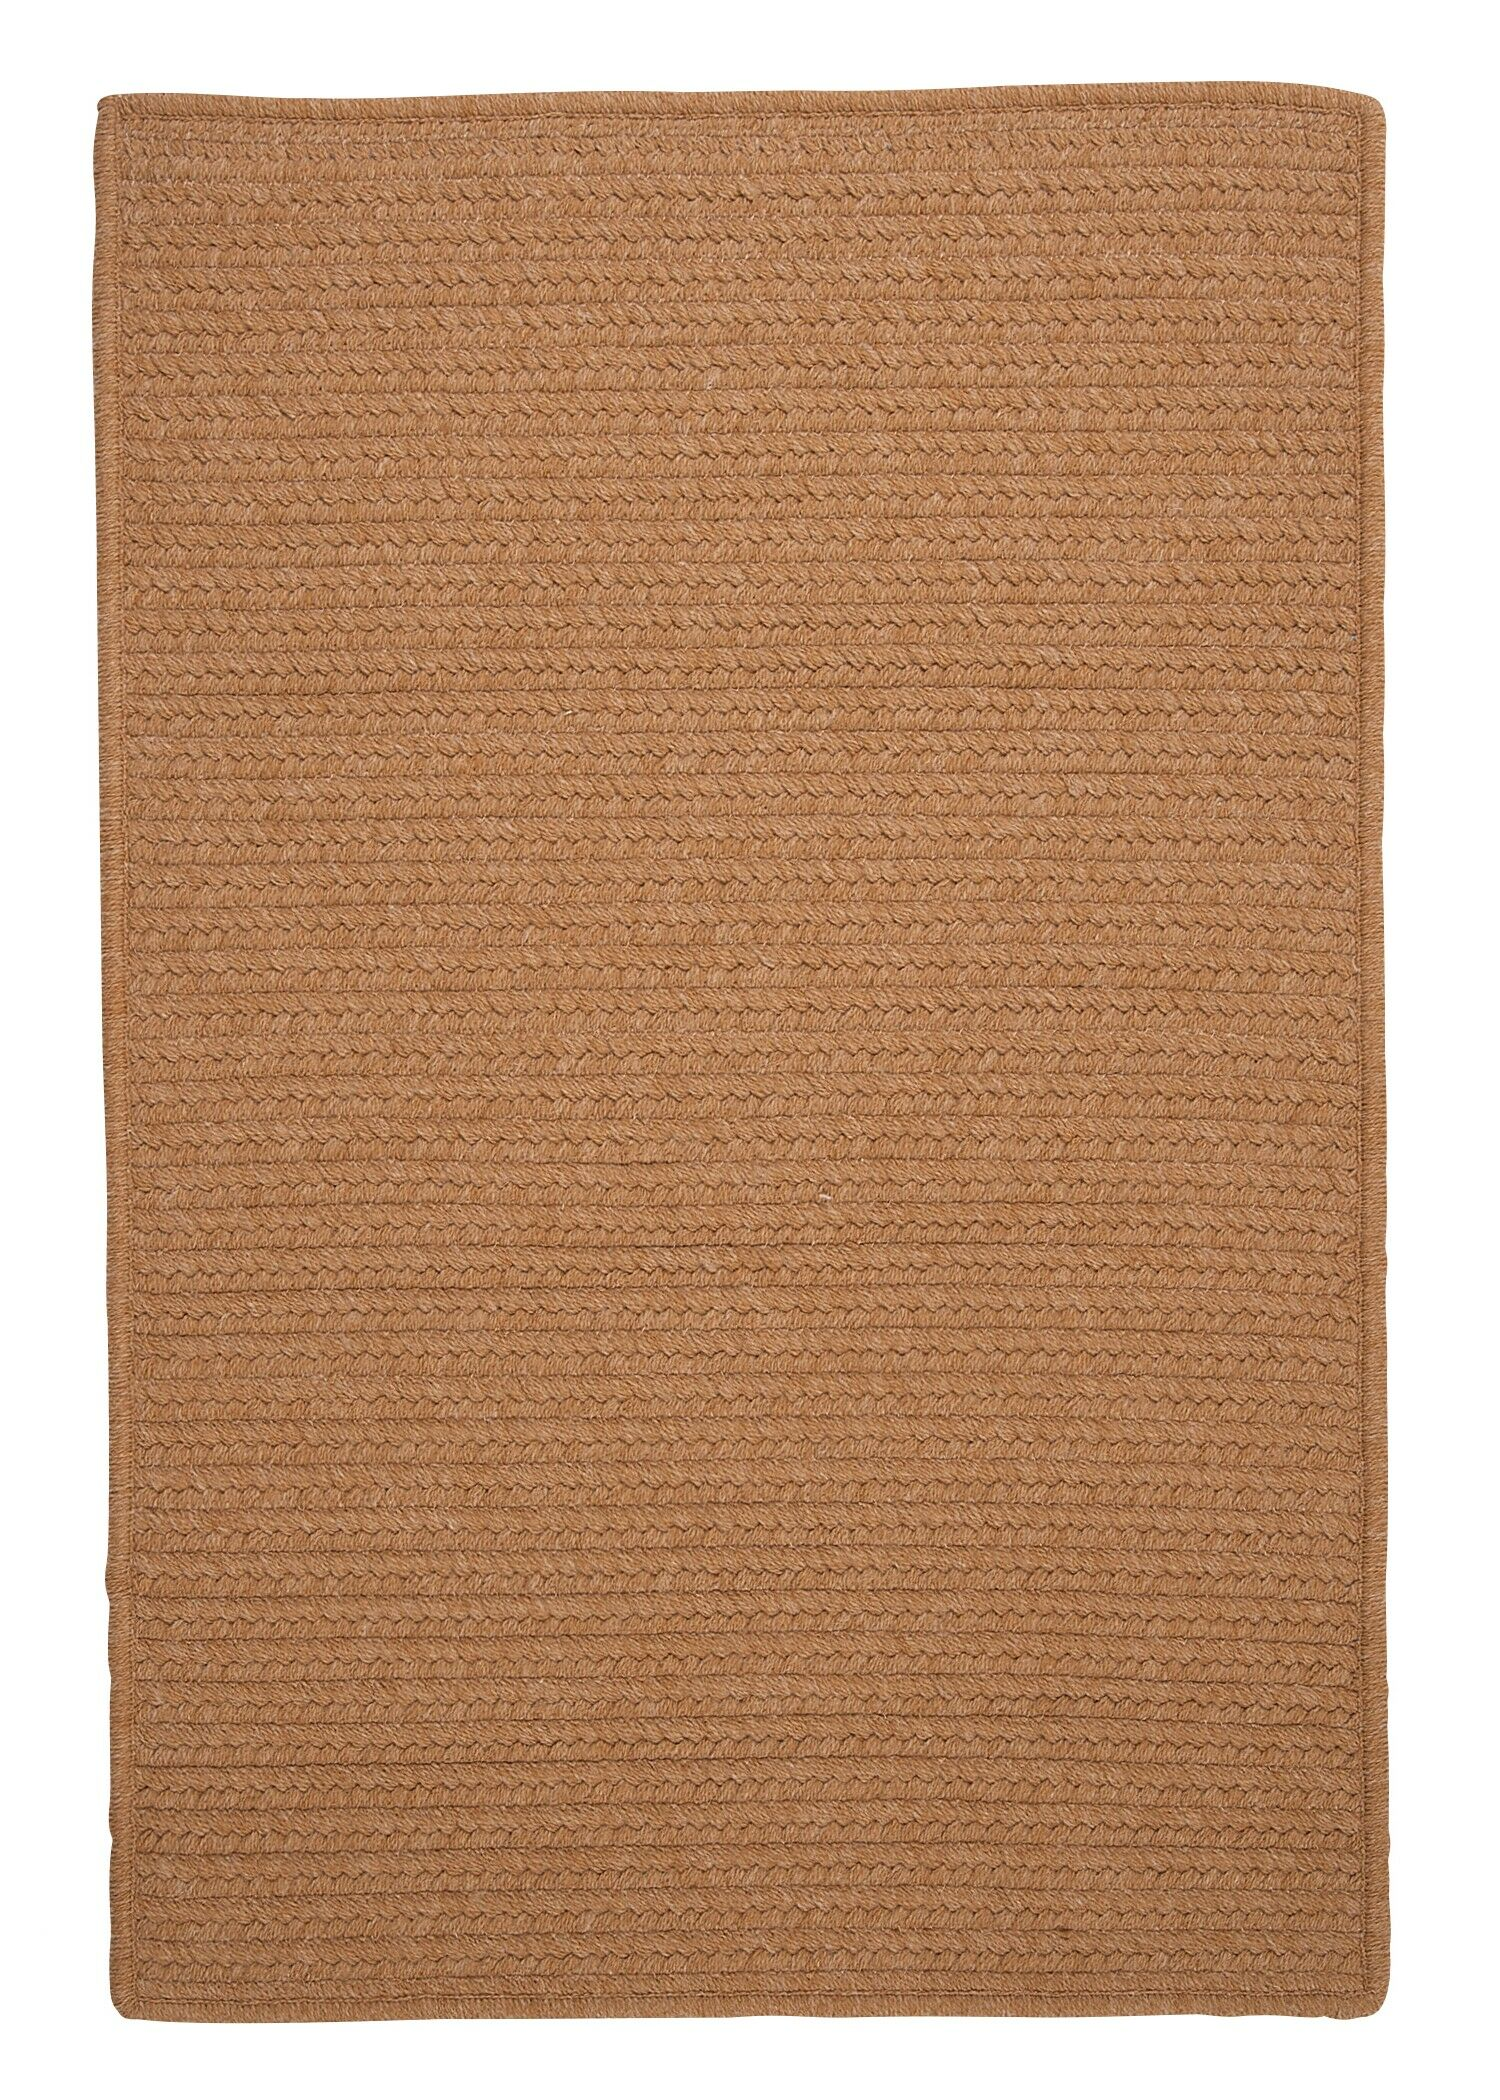 Westminster Evergold Area Rug Fringe: Not Included, Rug Size: Rectangle 4' x 6'